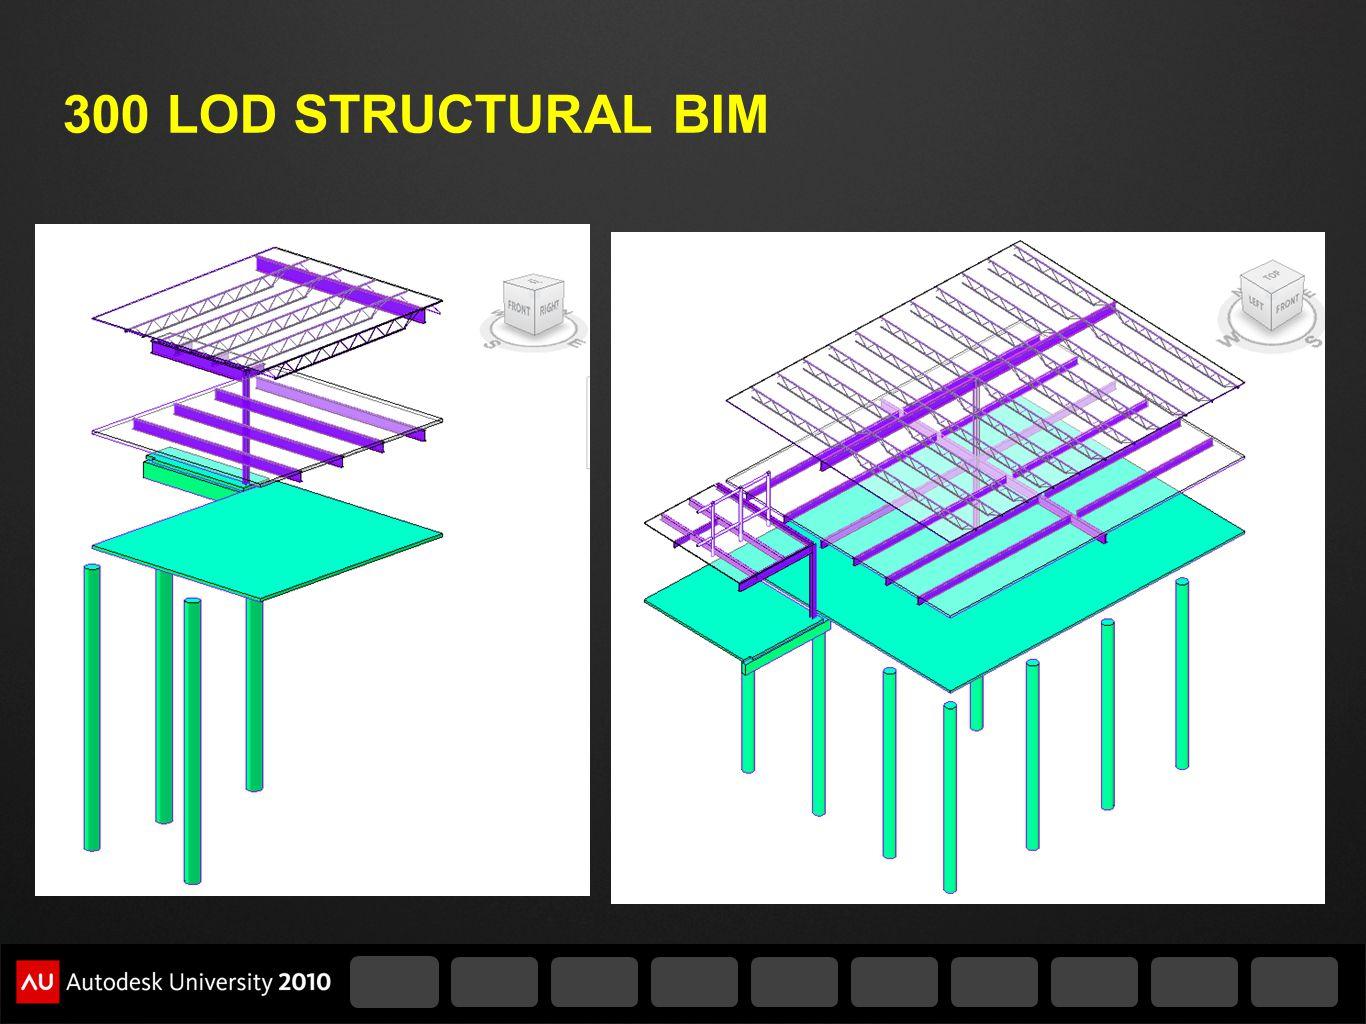 300 LOD STRUCTURAL BIM